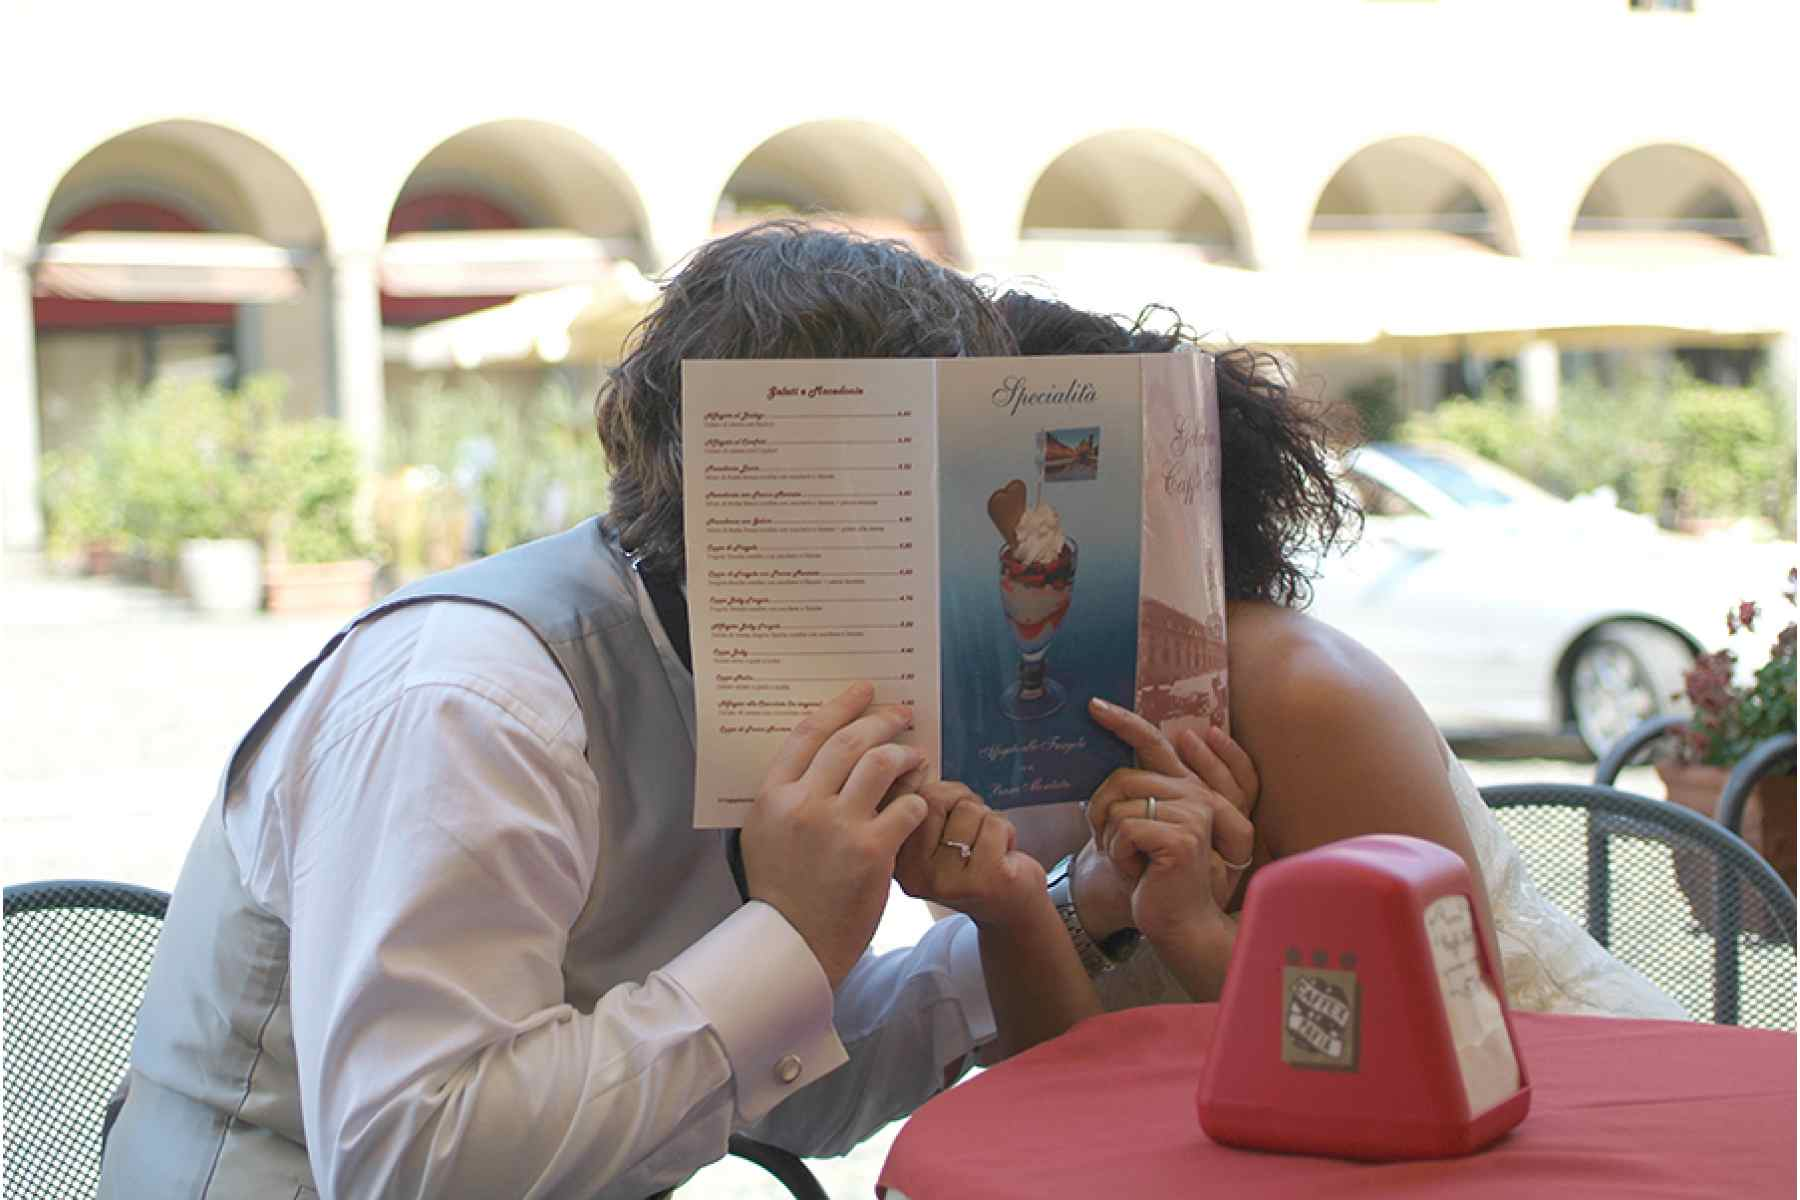 Wedding Week-end Photo Service Wedding Package